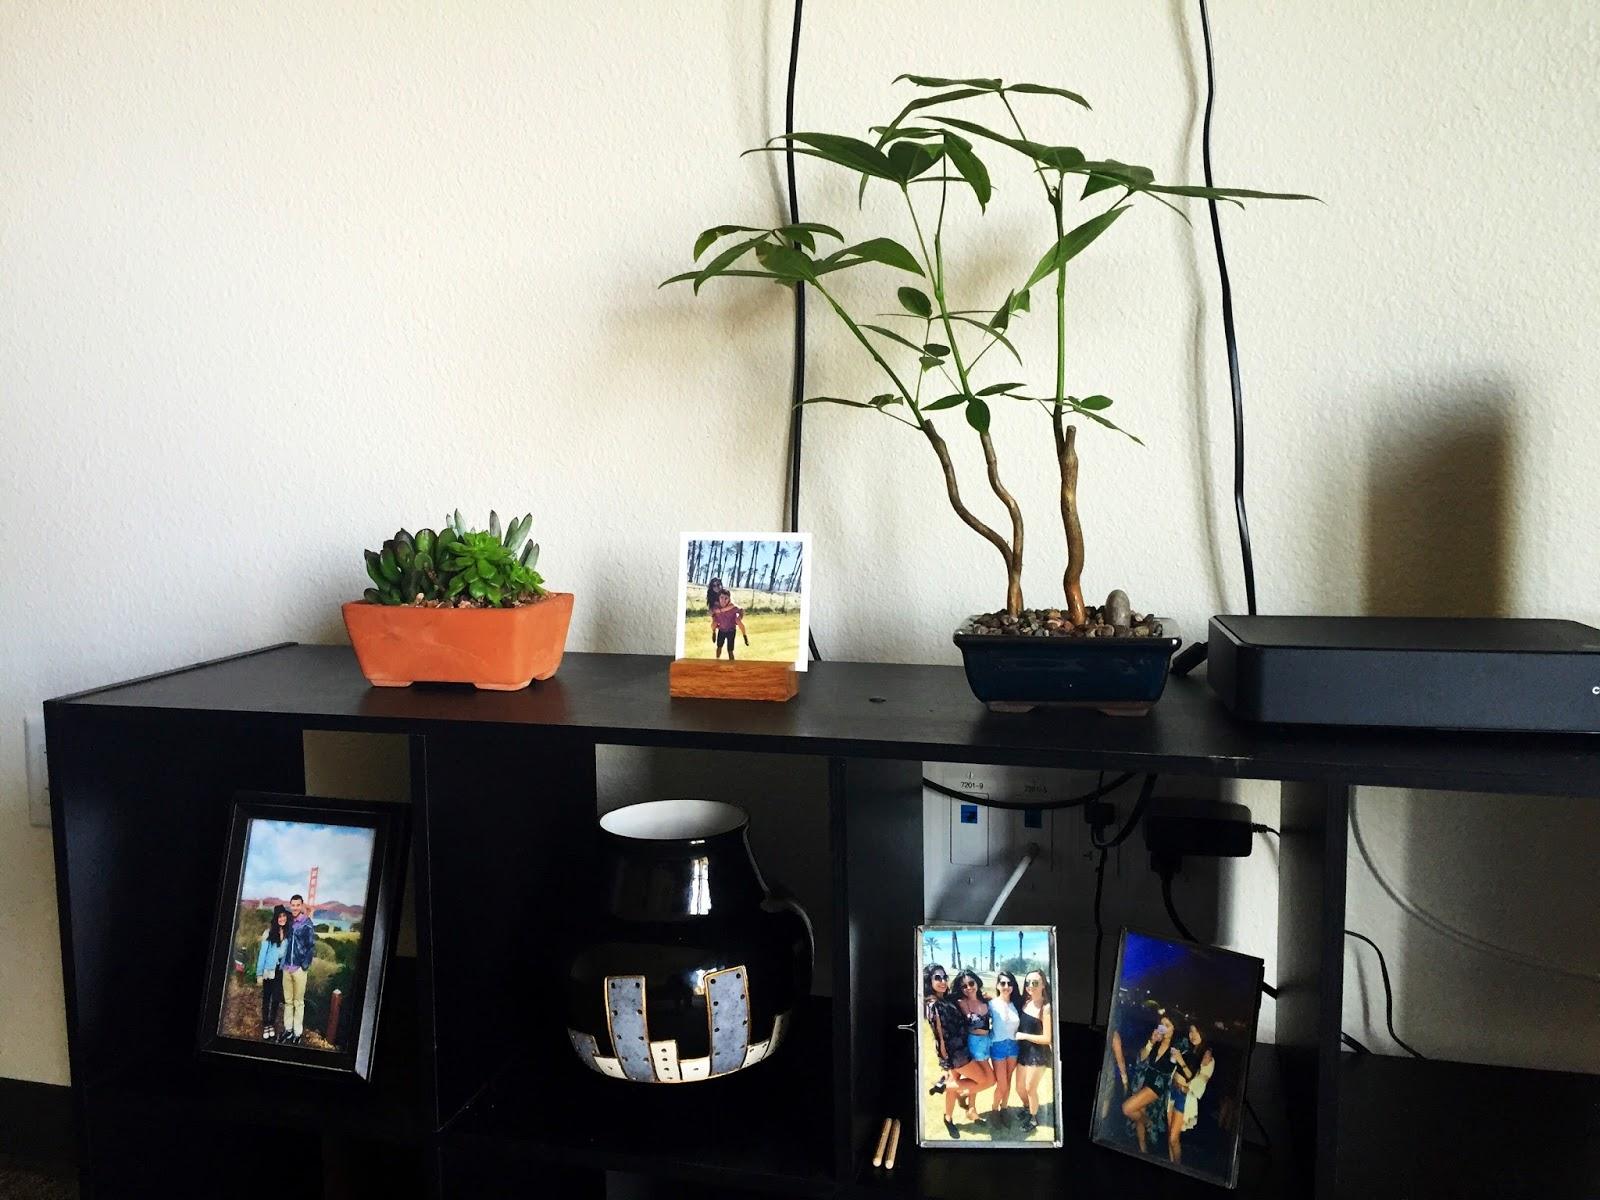 succulent and plant decor